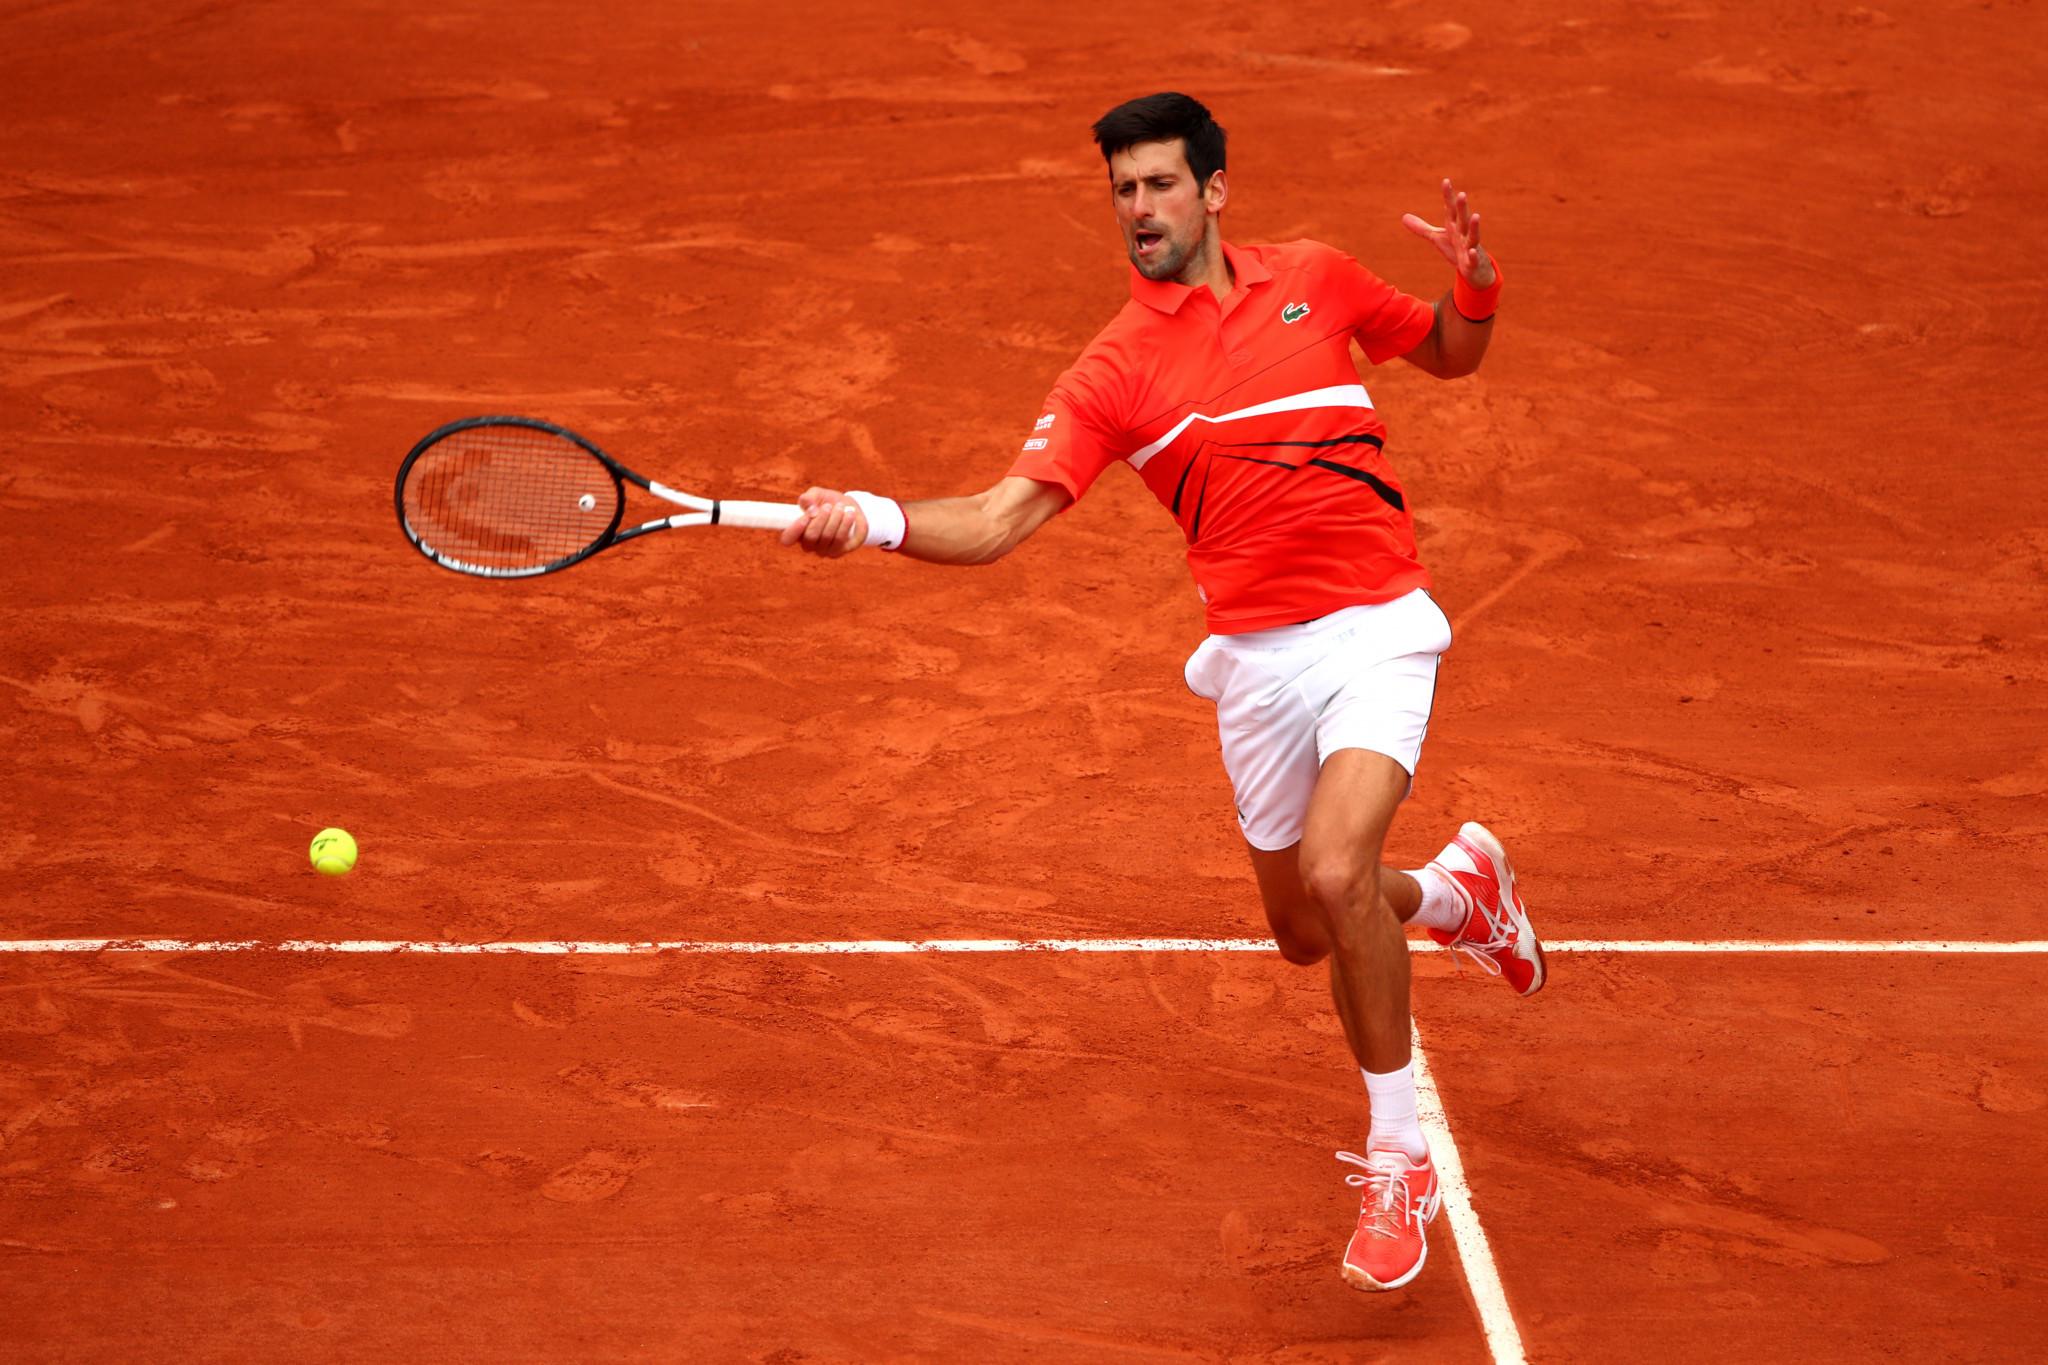 ATP announces changes to tennis rankings due to coronavirus